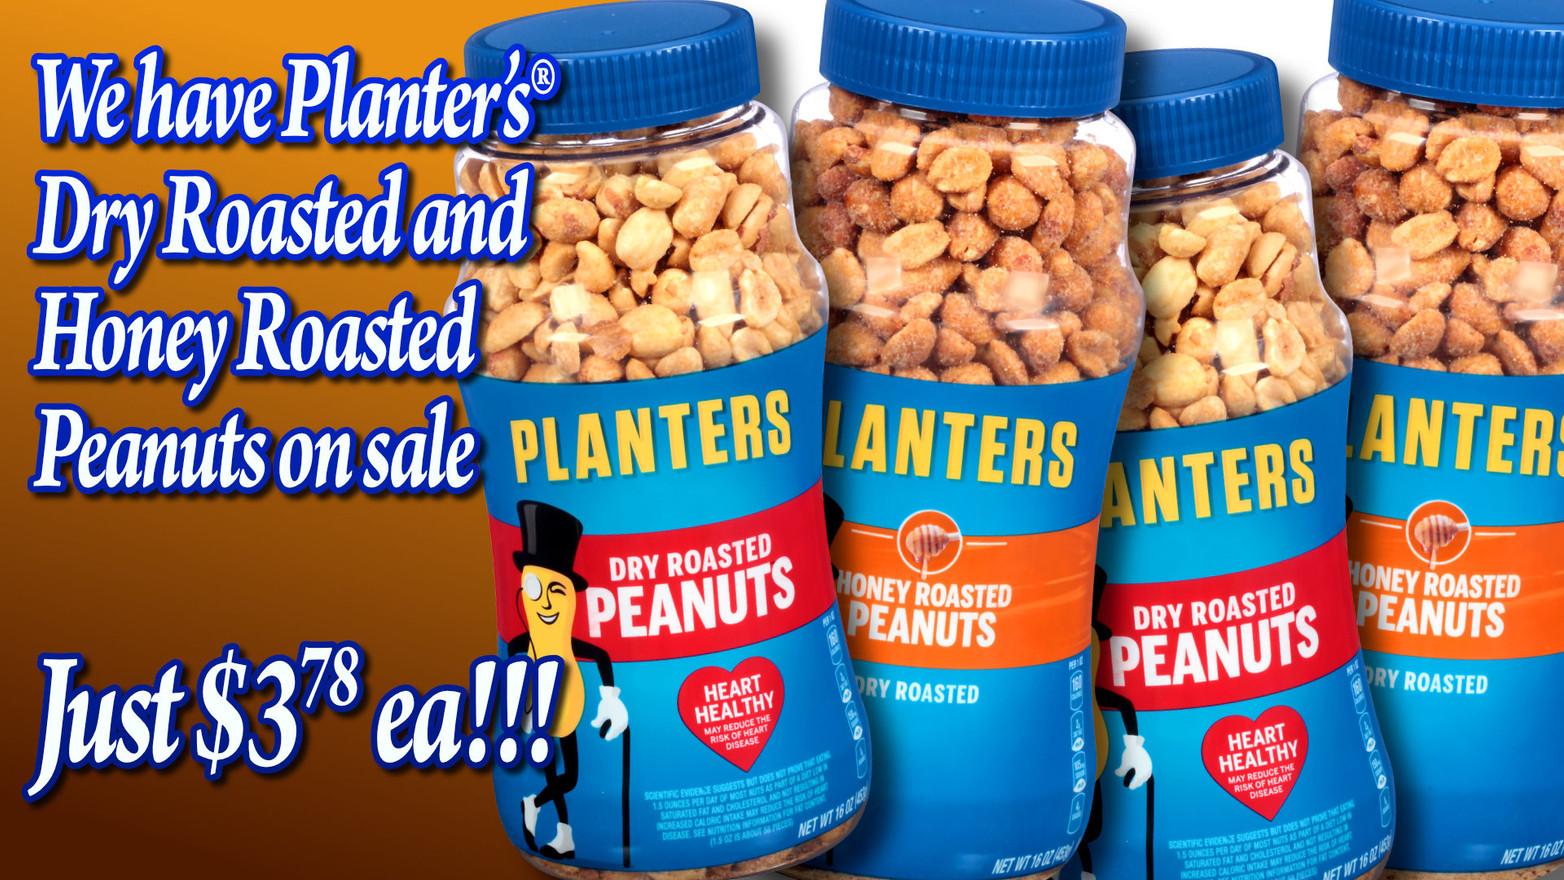 planters peanuts.jpg